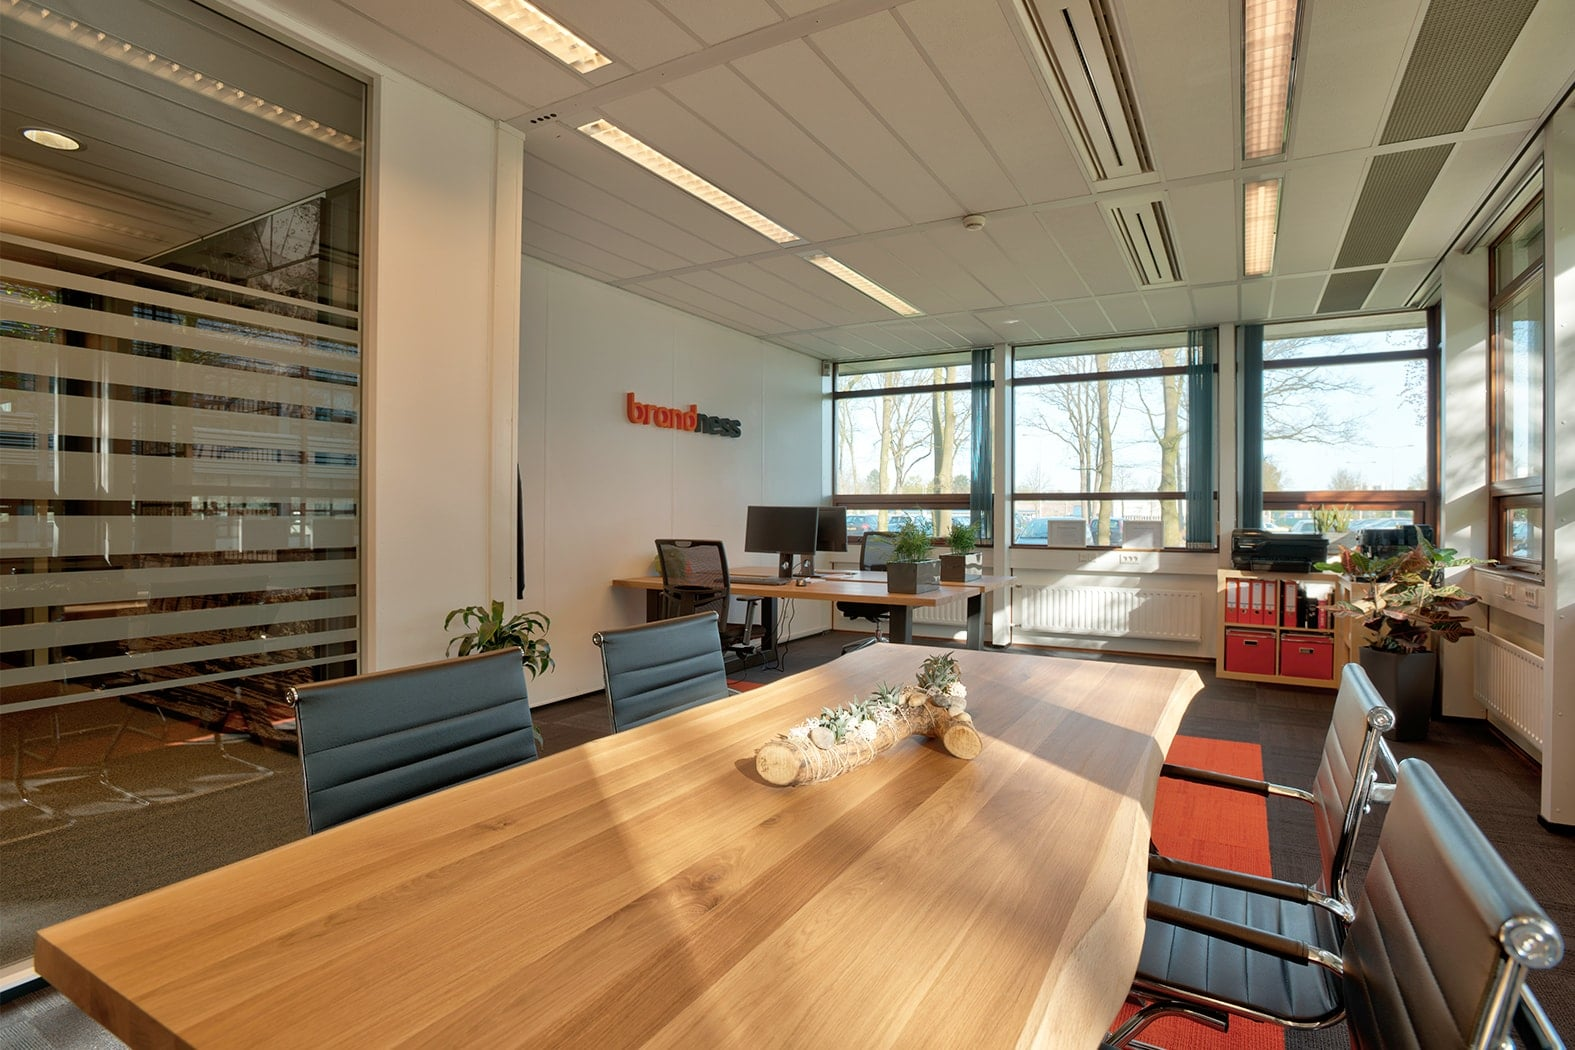 Kantoor huren in Gilze-Rijen | Crown Business Center Gilze-Rijen